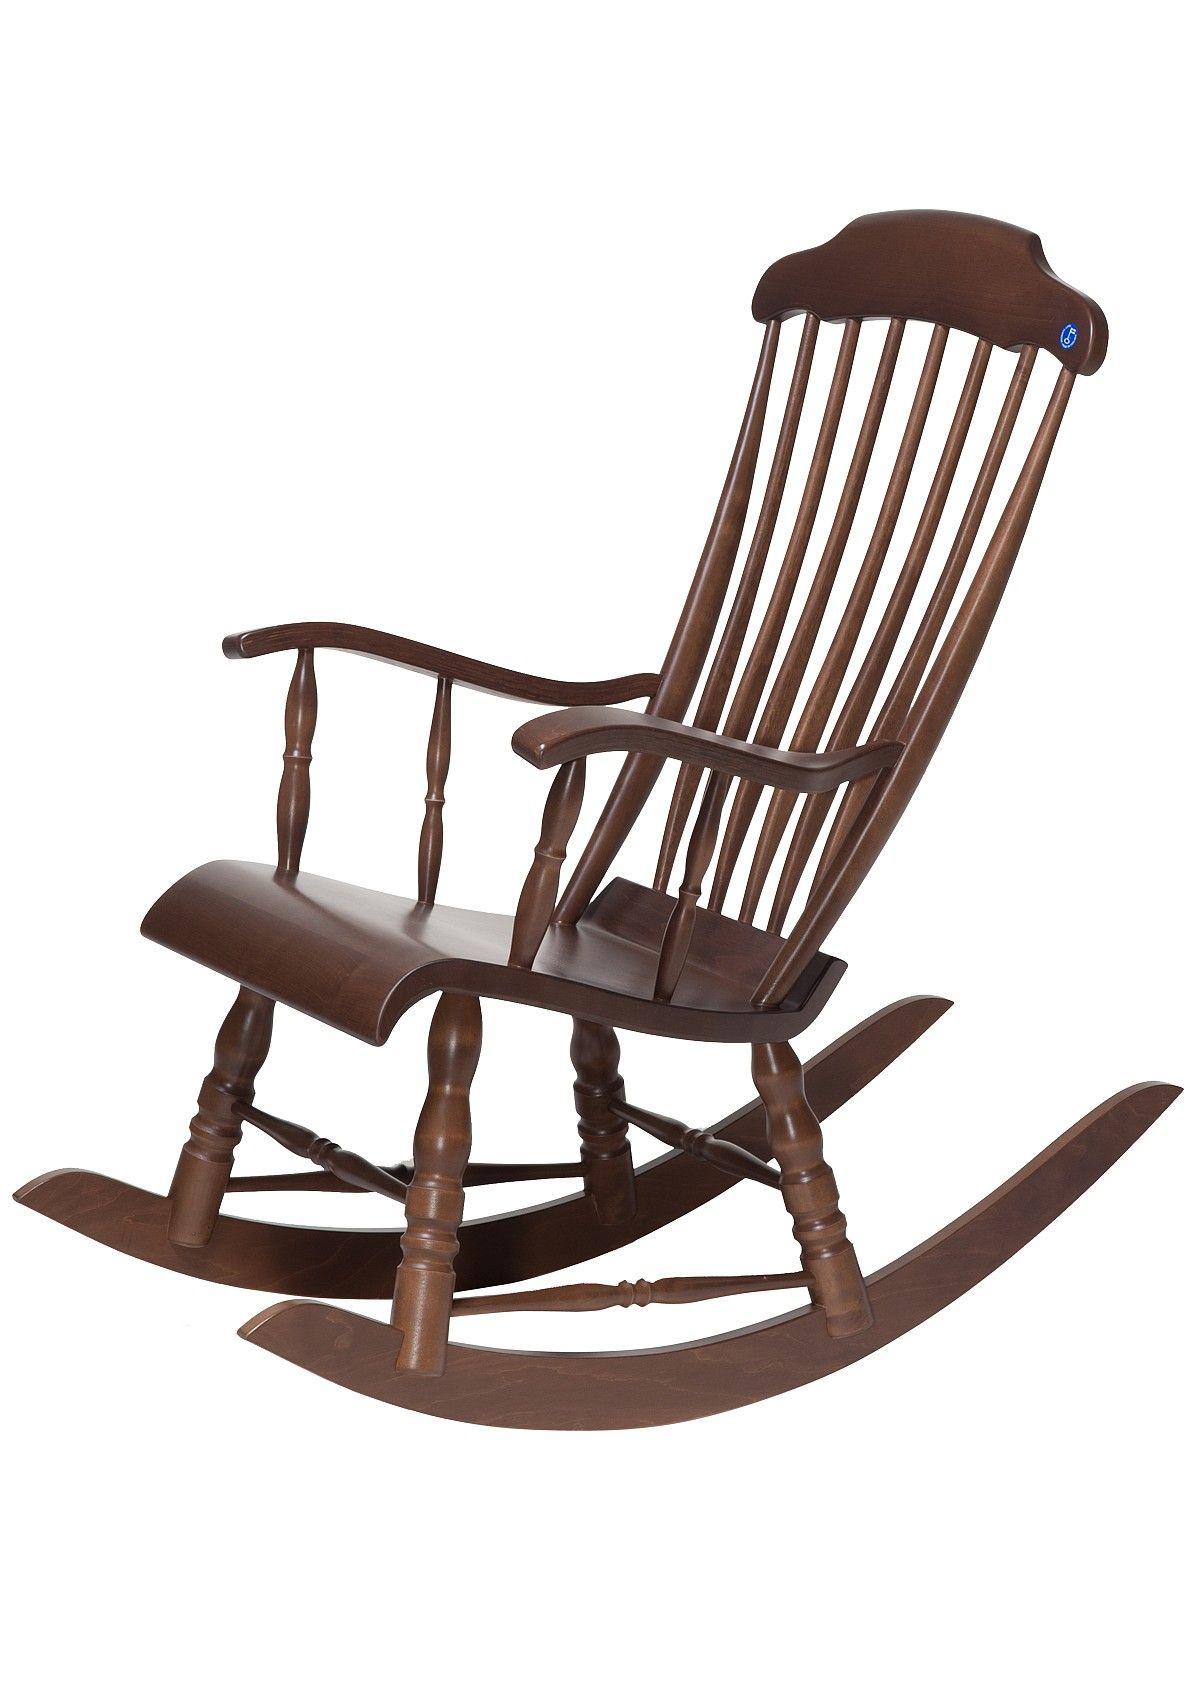 Swing Chair Malta Folding Rocking In A Bag Eimi Kaluste Keinutuoli ФИНСКАЯ ЁЛКА Pinterest